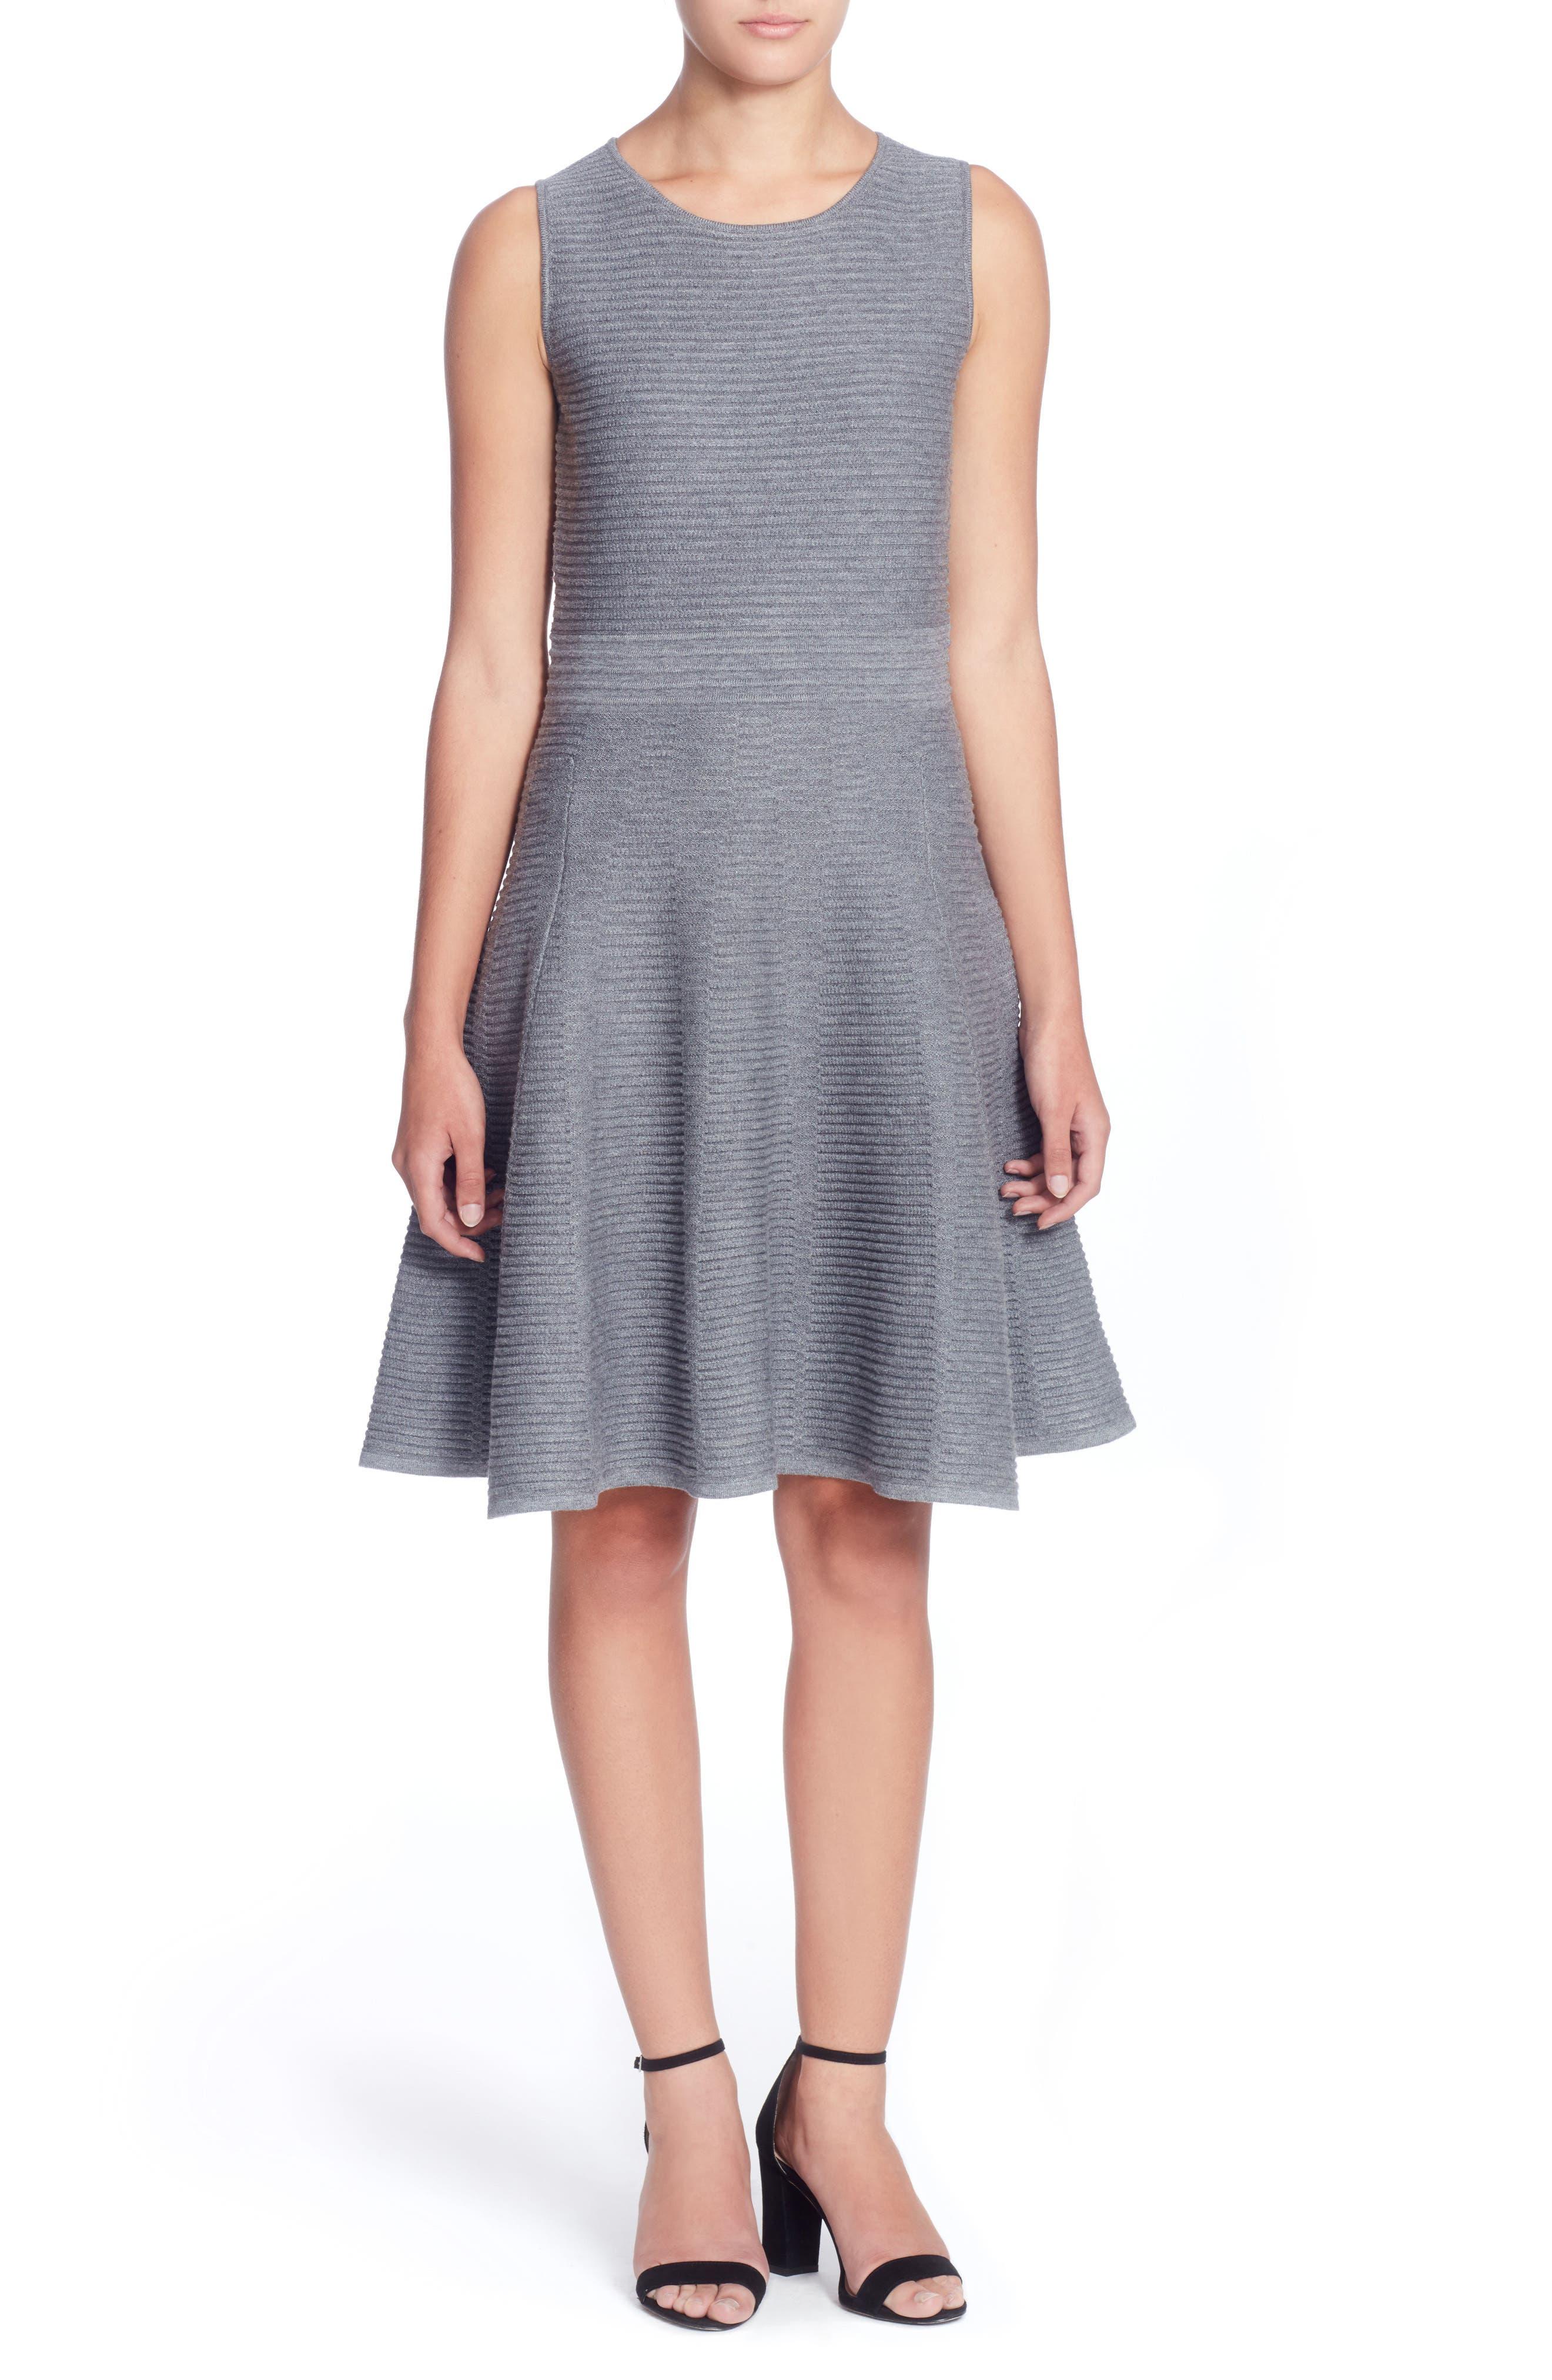 Main Image - Catherine Catherine Malandrino Trisha Fit & Flare Dress